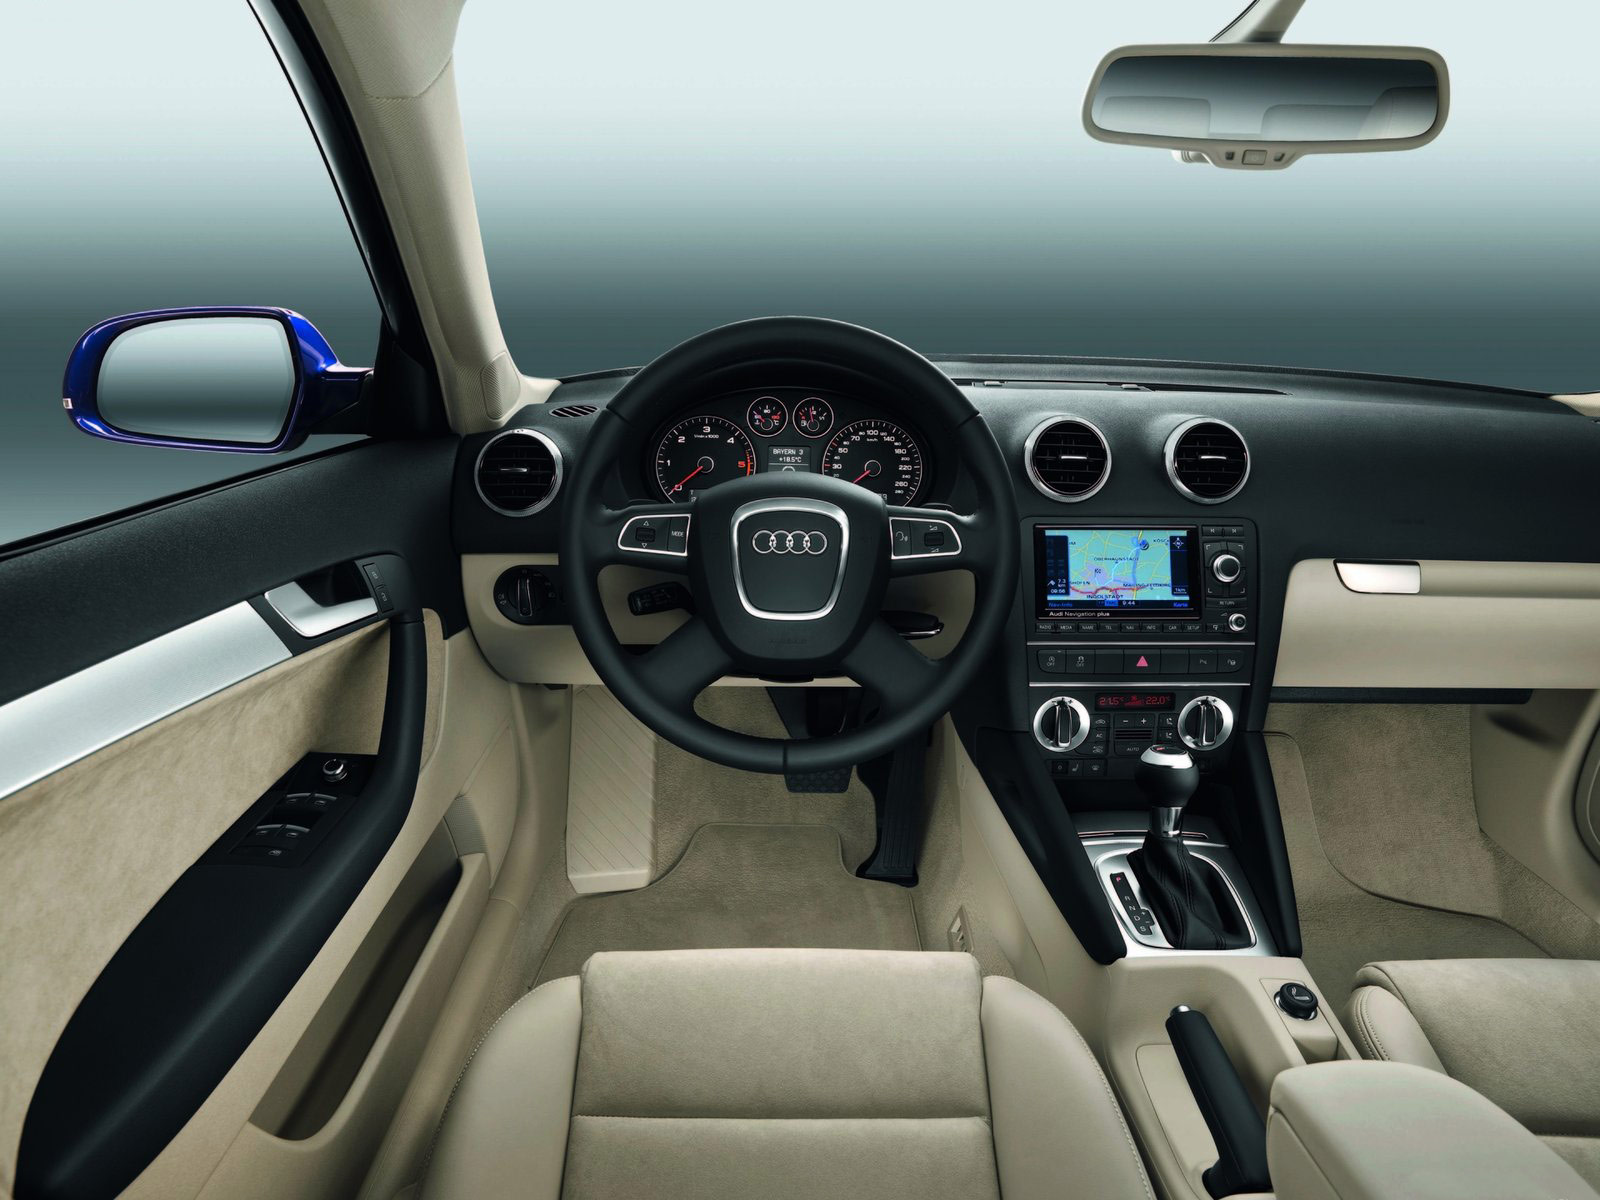 http://4.bp.blogspot.com/_m_XWwB73yT4/TIQV58rC8ZI/AAAAAAAACMo/47Pm0MjILy8/s1600/Audi_A3-Sportback_2011_car_pictures8.jpg